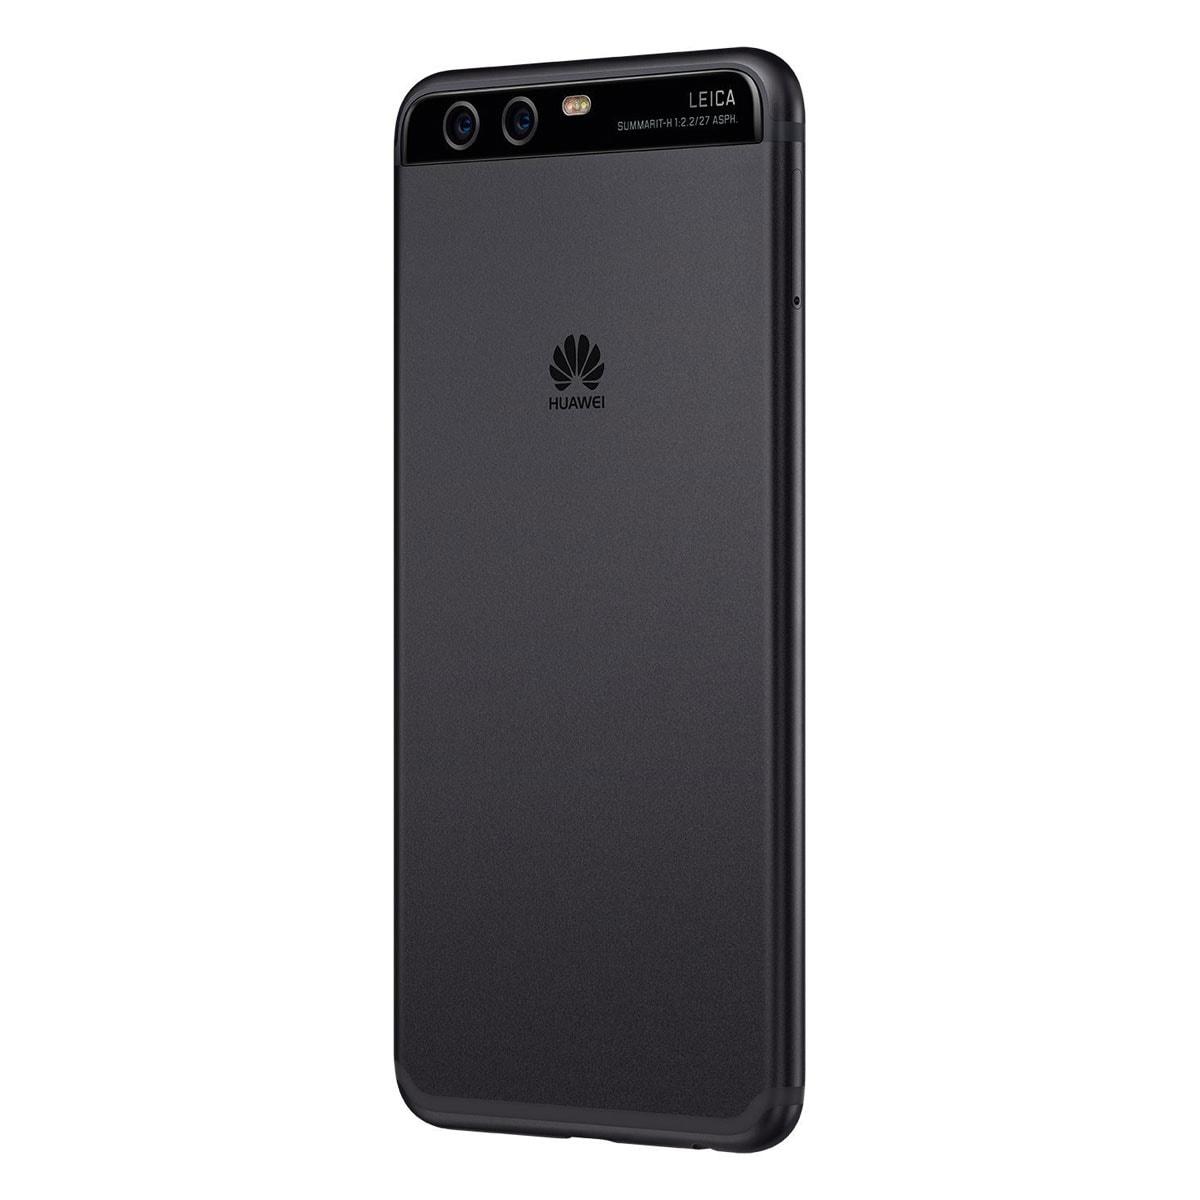 Huawei Téléphonie Huawei P10 64Go Black (51091FGC) - Achat / Vente Téléphonie sur Cybertek.fr - 1